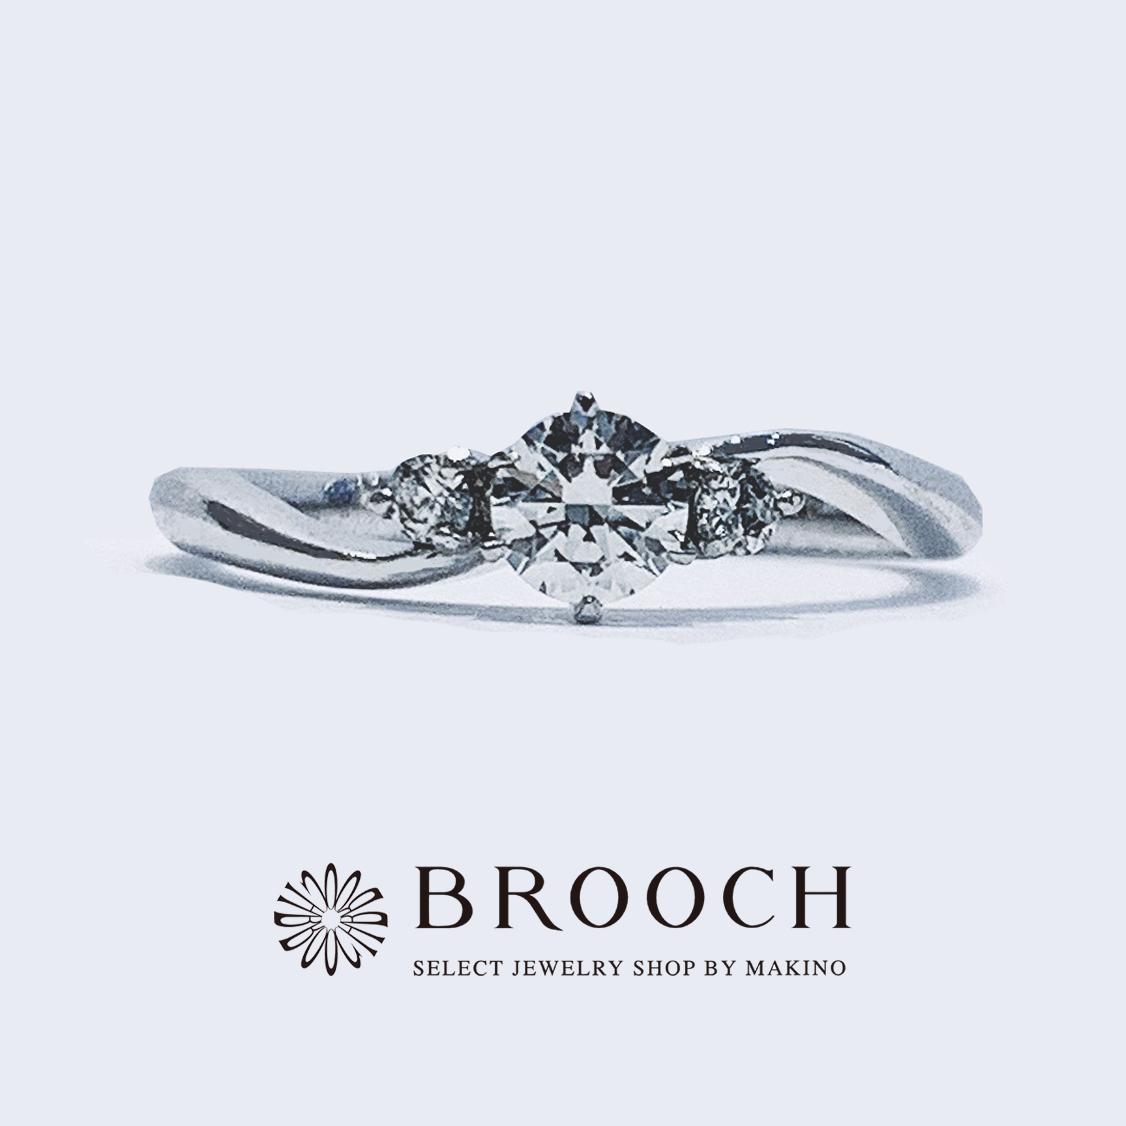 BROOCH 婚約指輪 エンゲージリング サイドメレ ウェーブデザイン